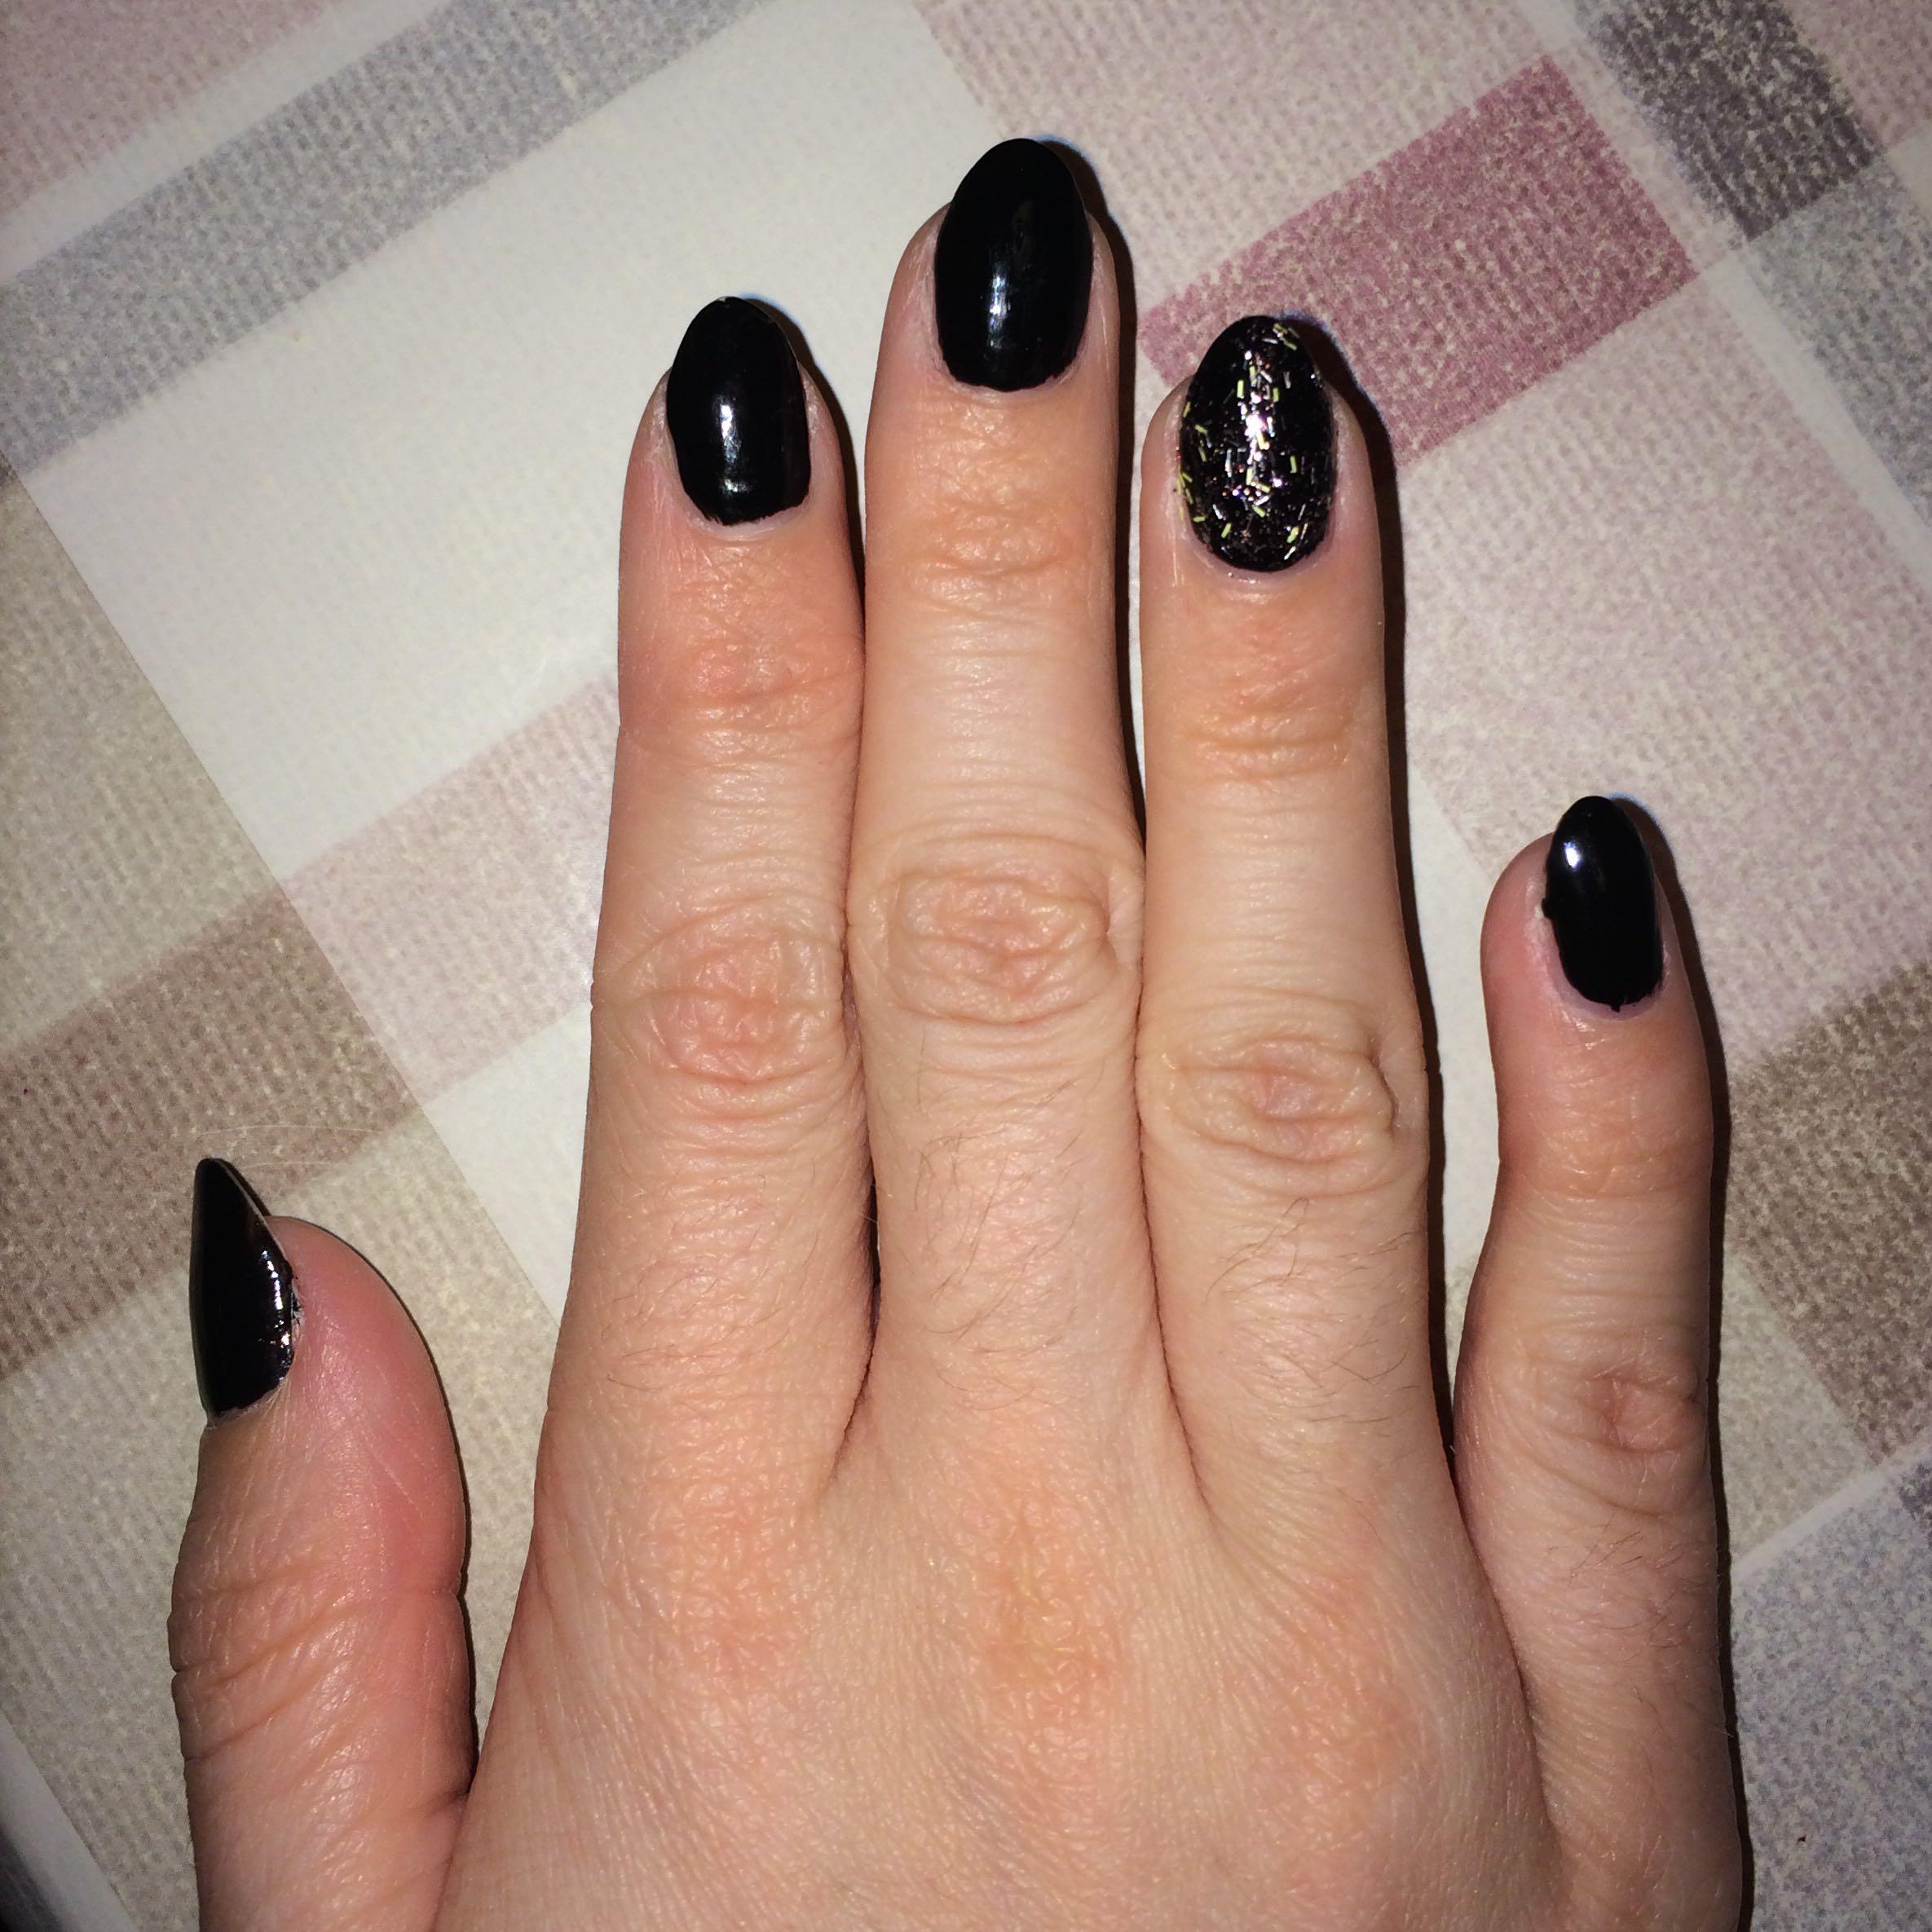 sch ne n gel sehen anders aus oder wie kann ich sie ver ndern nagellack geln gel nagelform. Black Bedroom Furniture Sets. Home Design Ideas